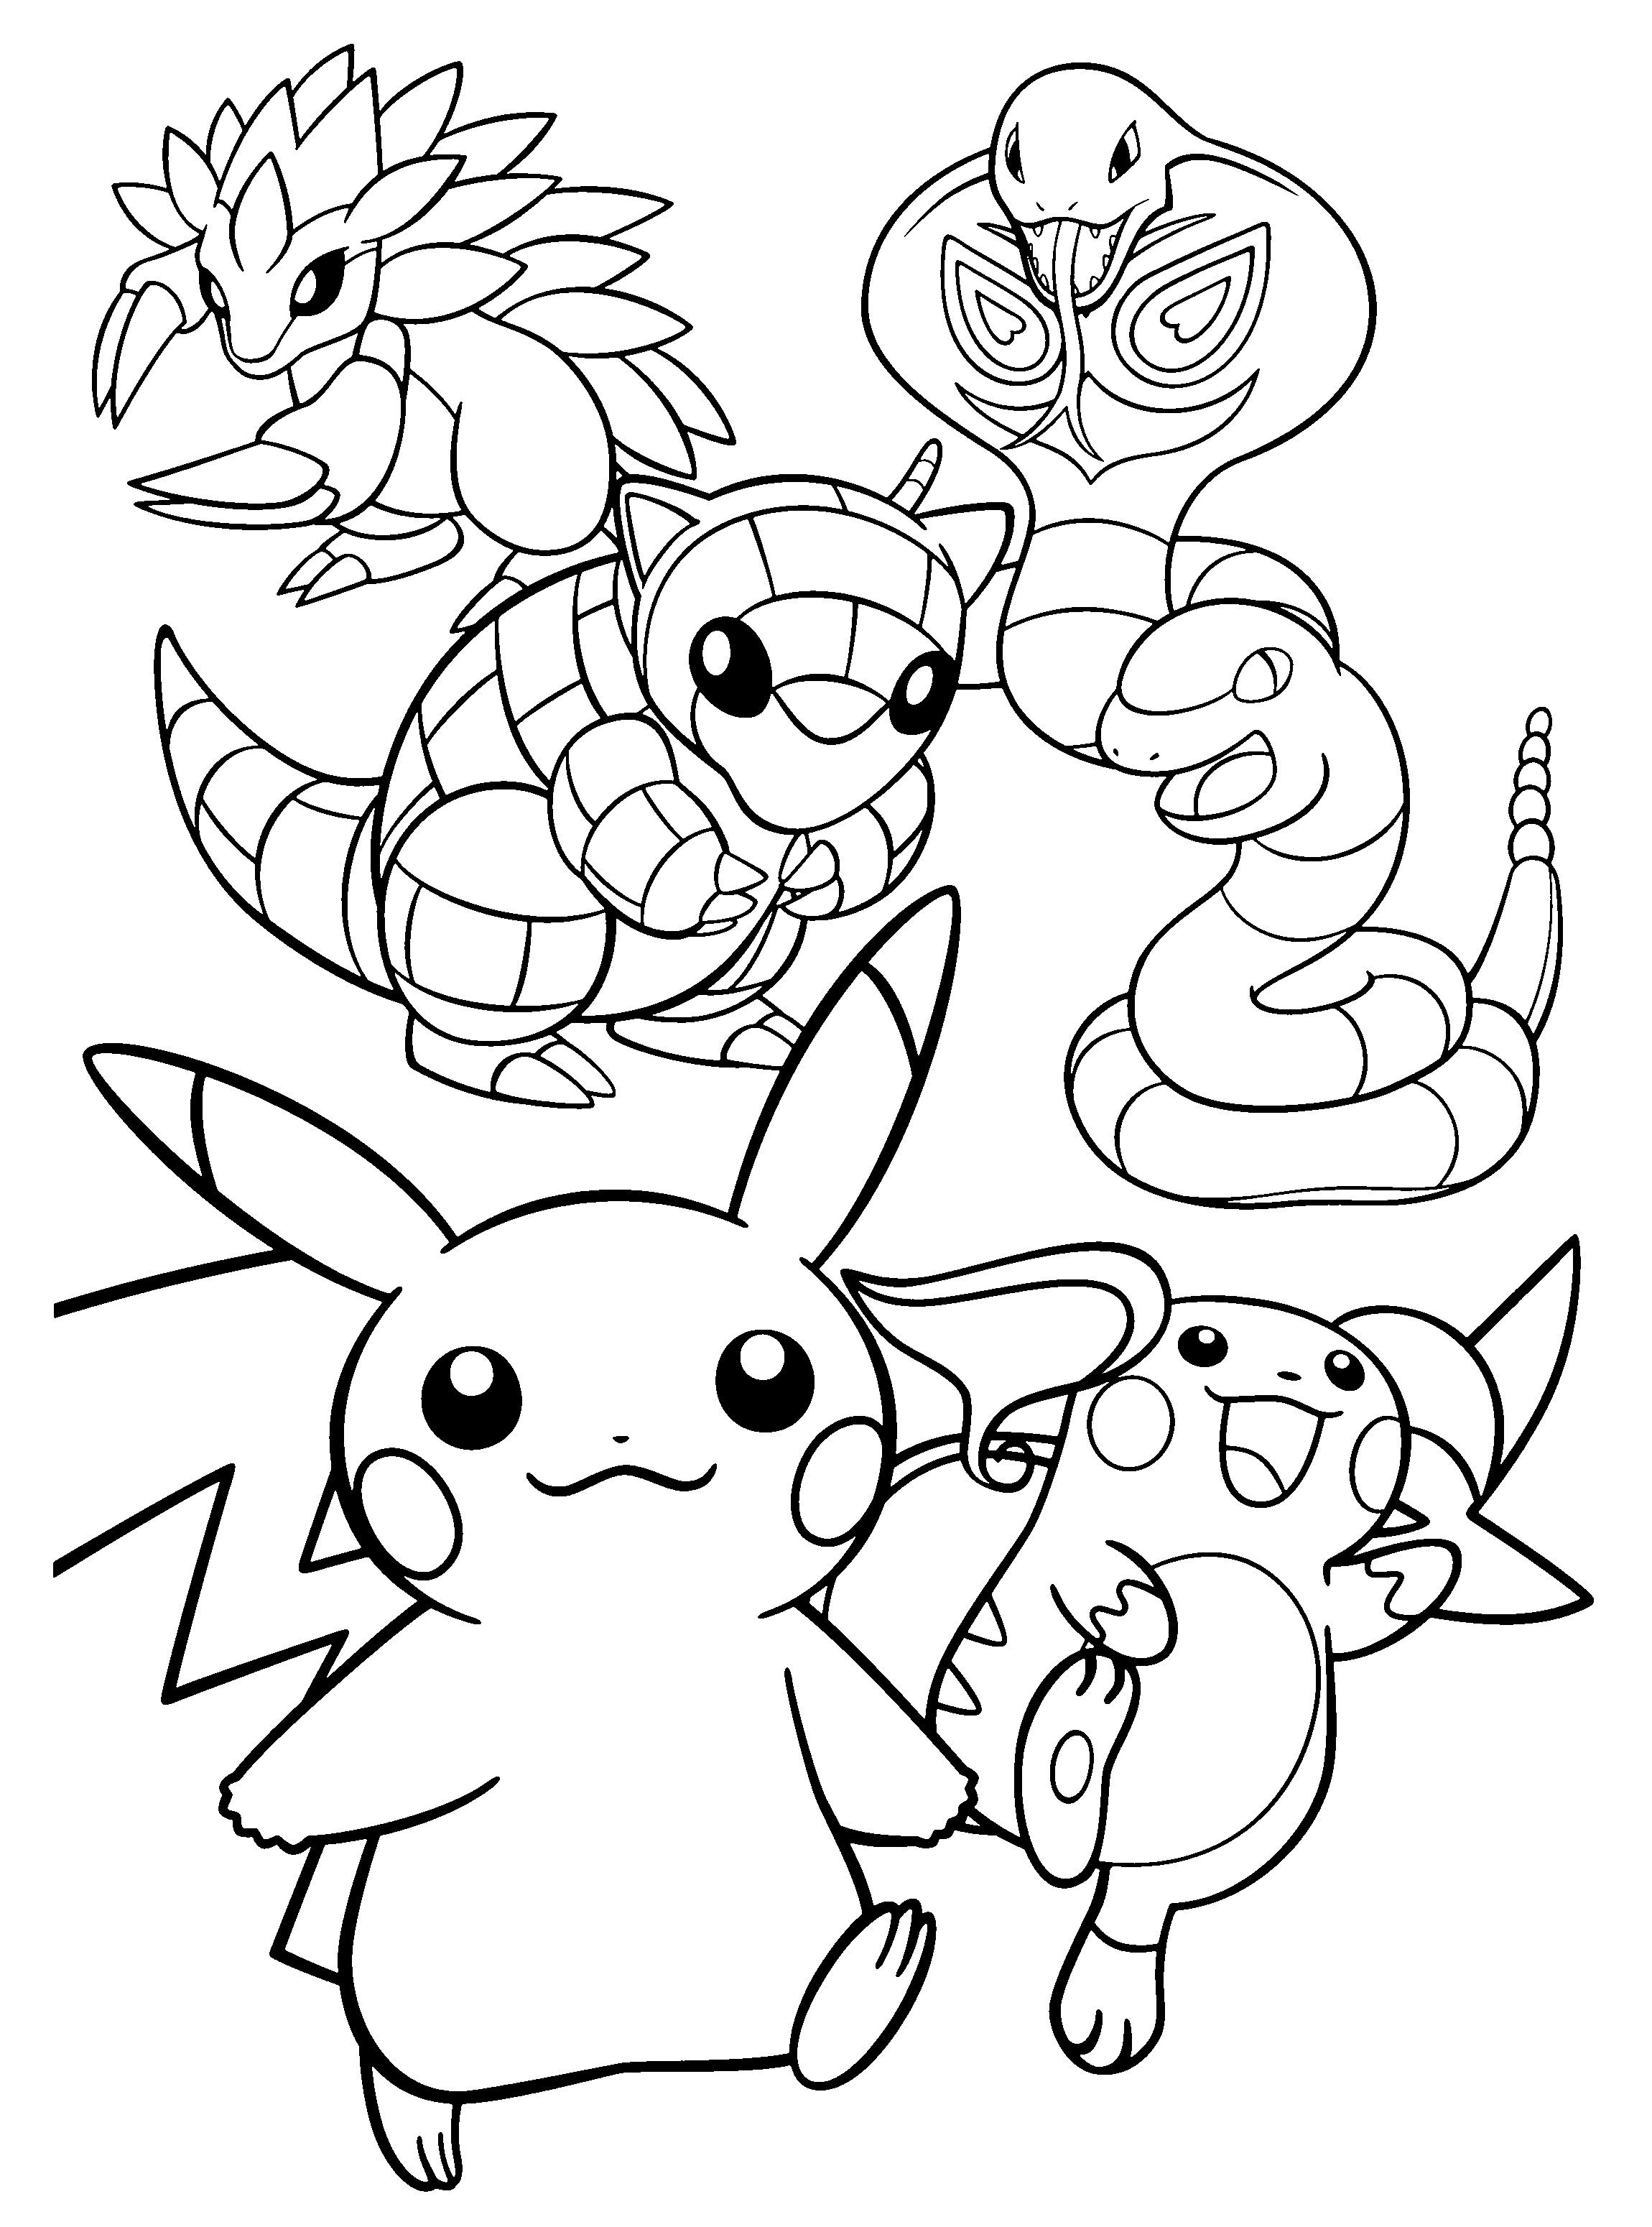 Pokemon Go Pikachu Raichu Sandshrew Sandslash Arbok And Ekans Coloring Pages In 2021 Pokemon Coloring Sheets Pokemon Coloring Pages Pokemon Coloring